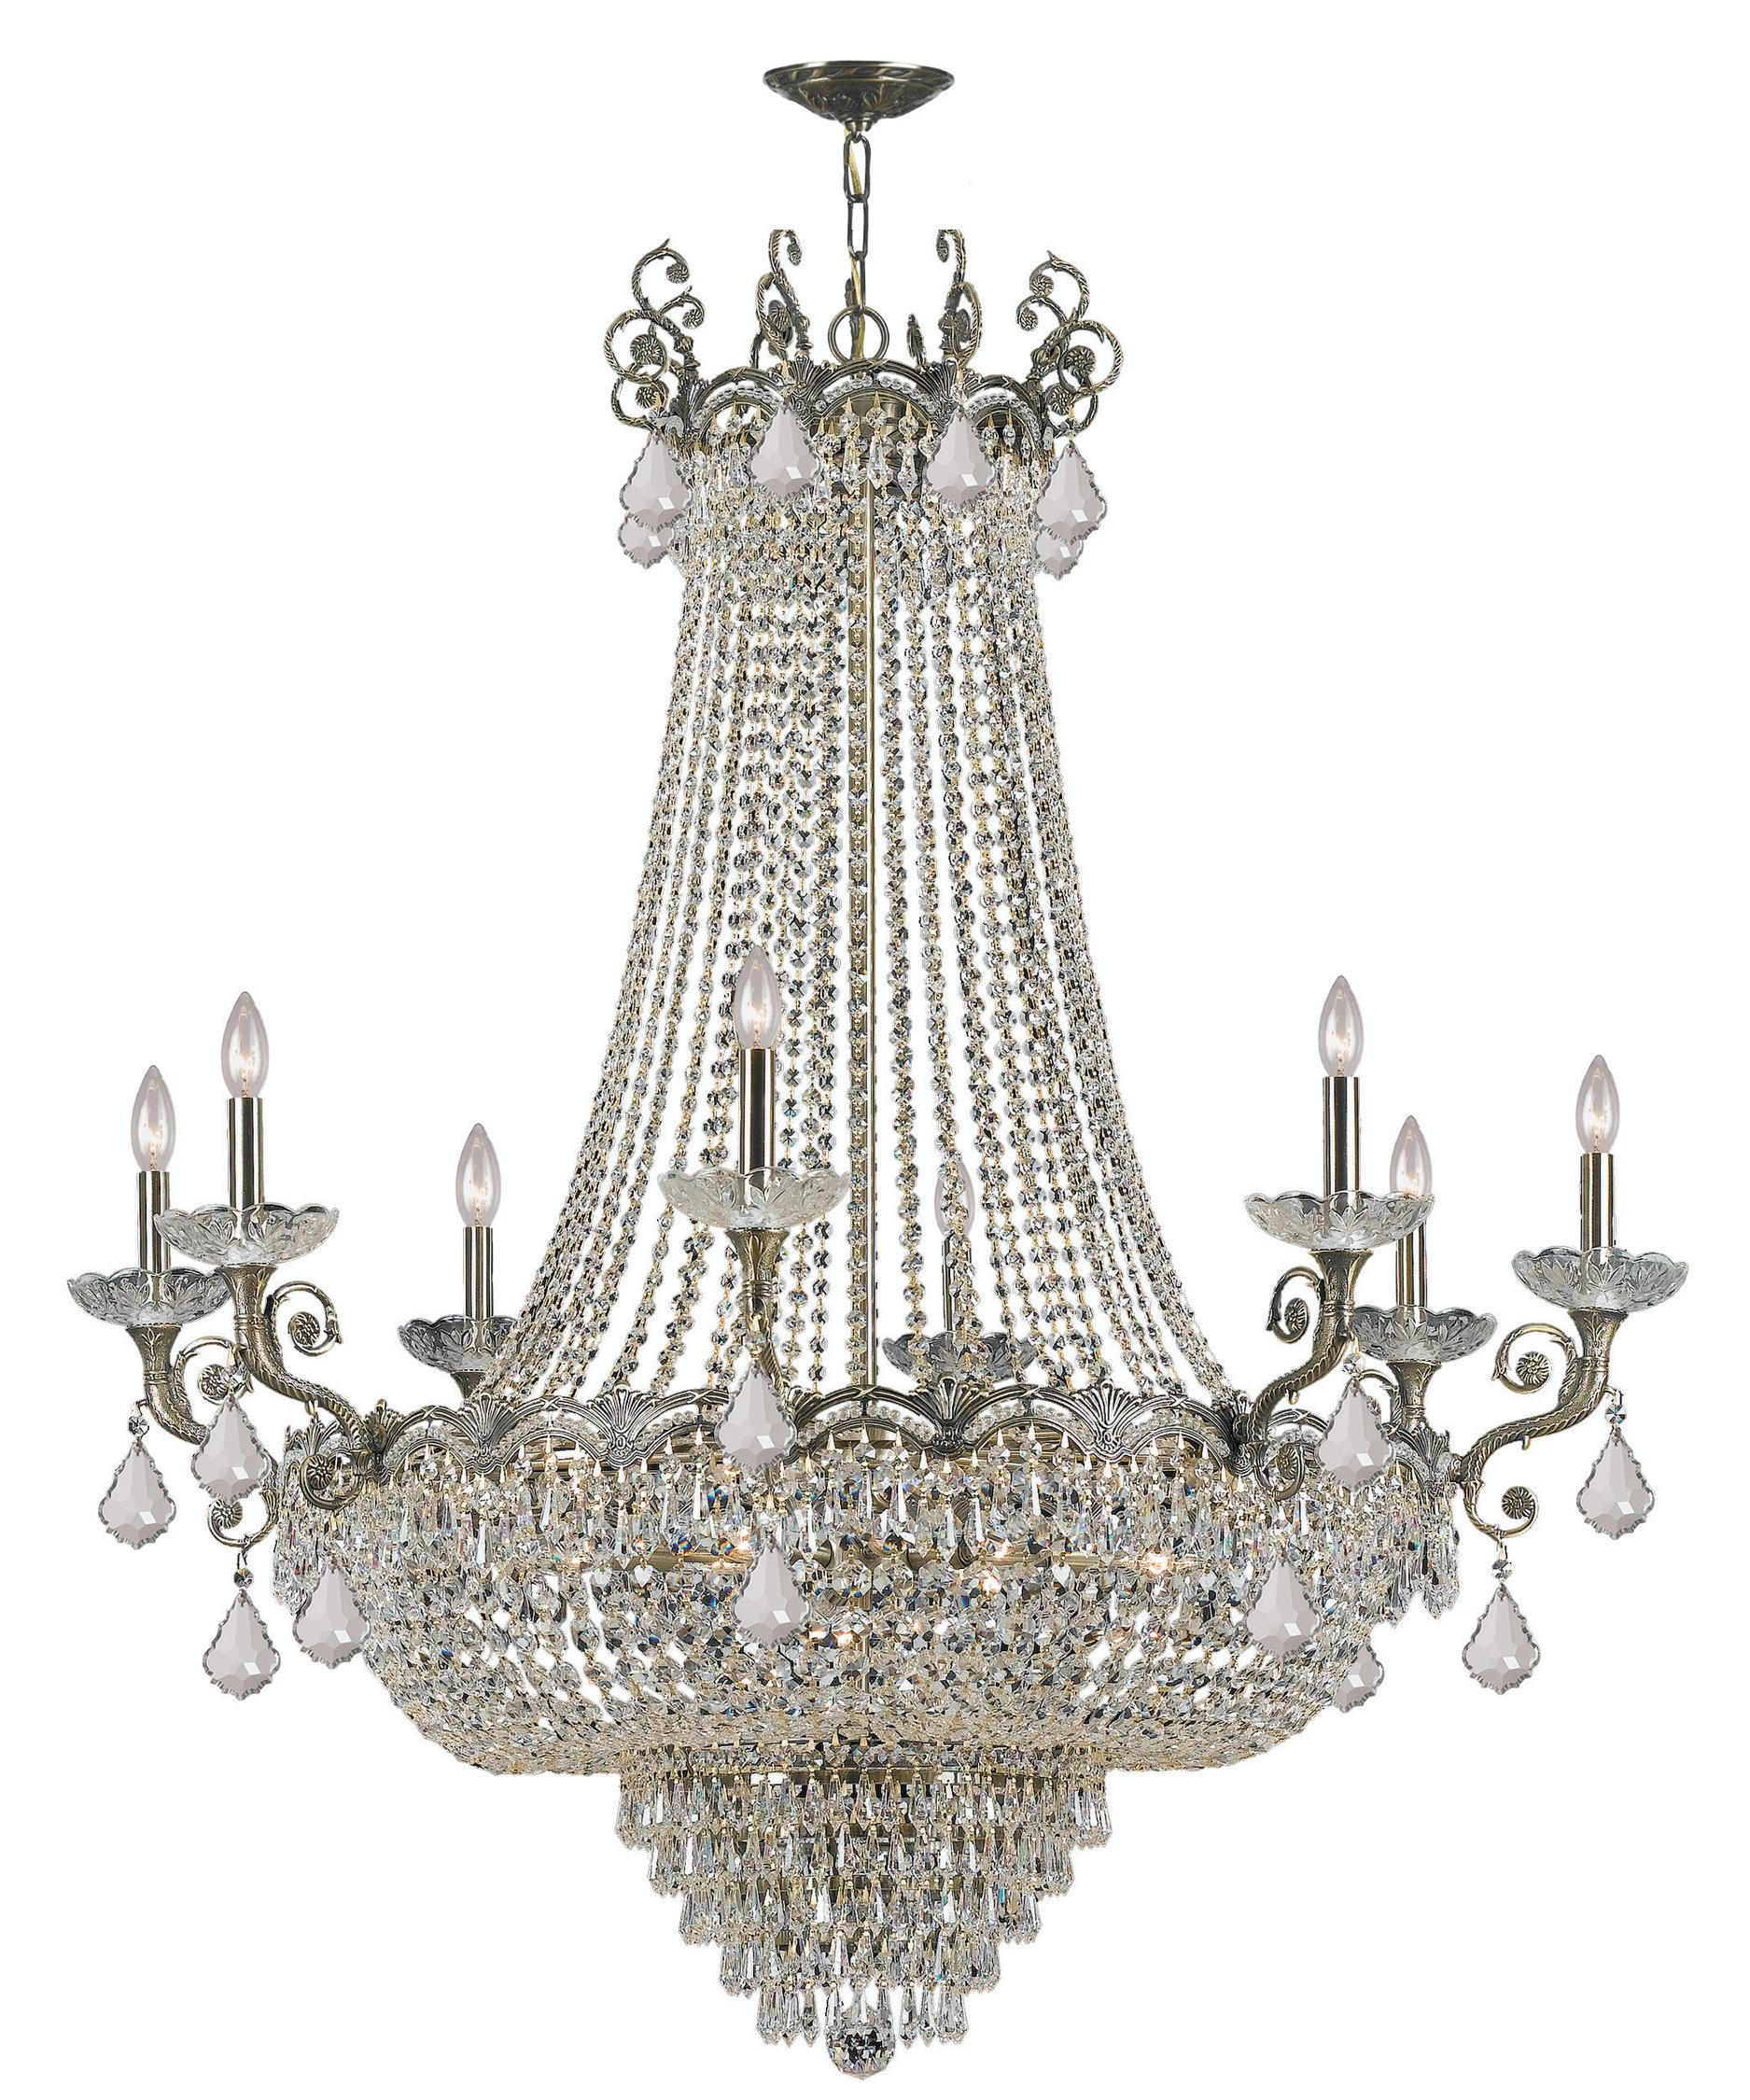 crystorama majestic 46 inch wide 20 light chandelier capitol lighting - Crystorama